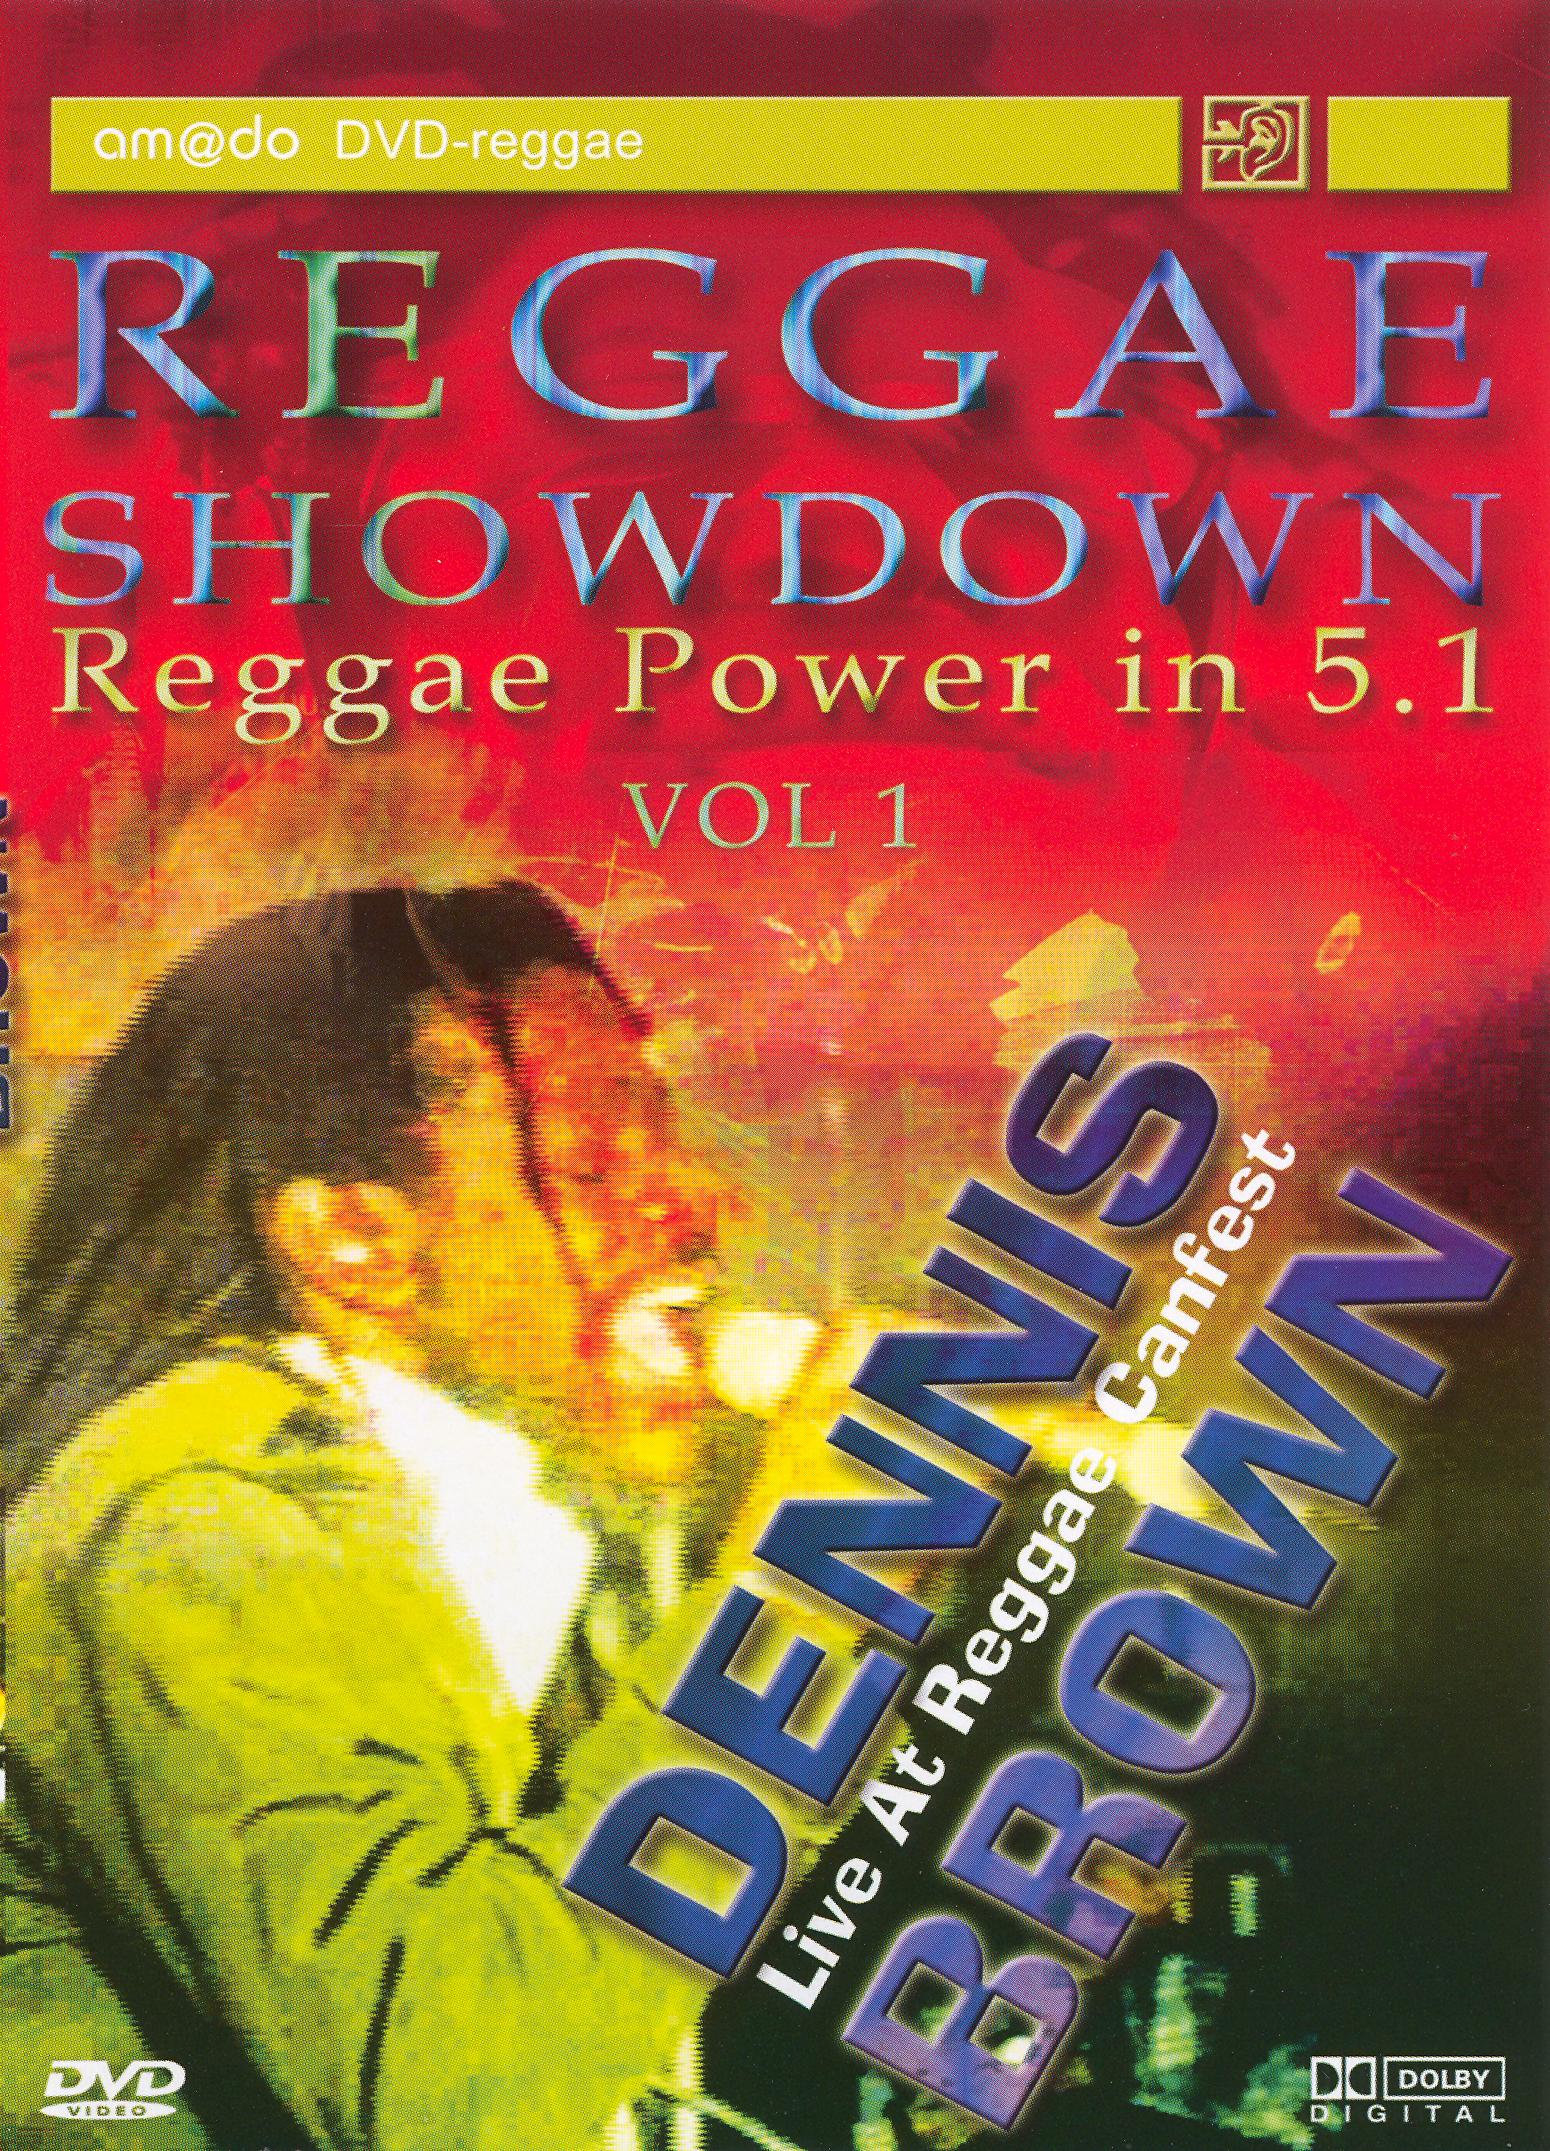 Reggae Showdown, Vol. 1: Dennis Brown - Live at Reggae Canfest